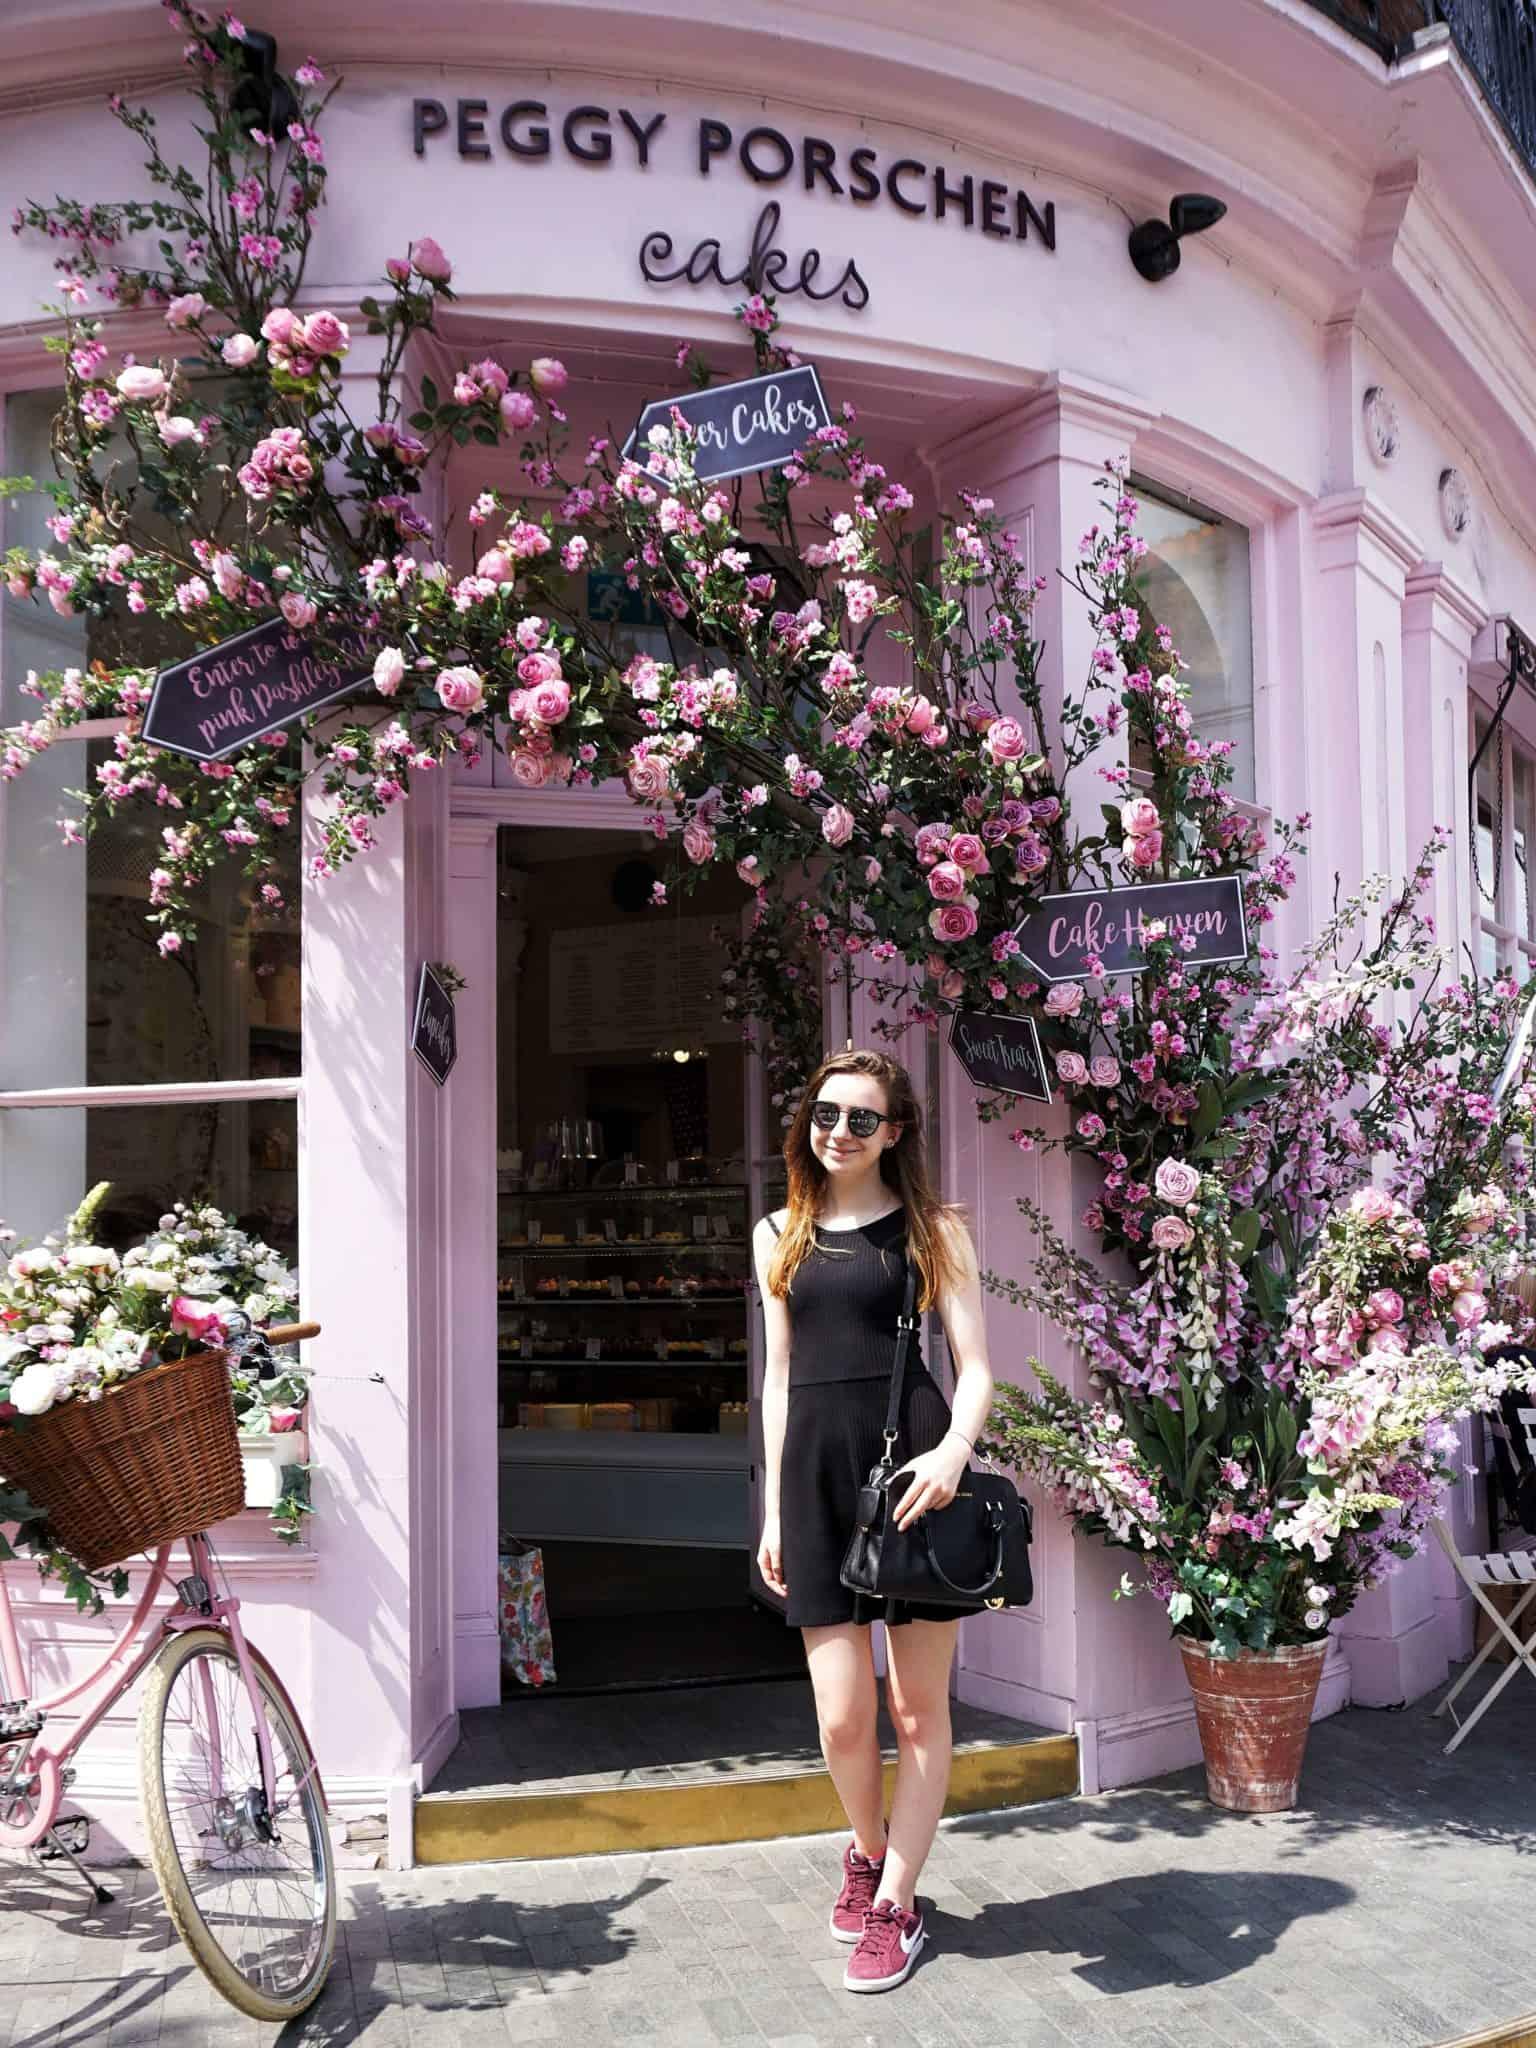 Peggy Porschen Parlour: Belgravia London England: Is this the cutest café and cake shop in London?